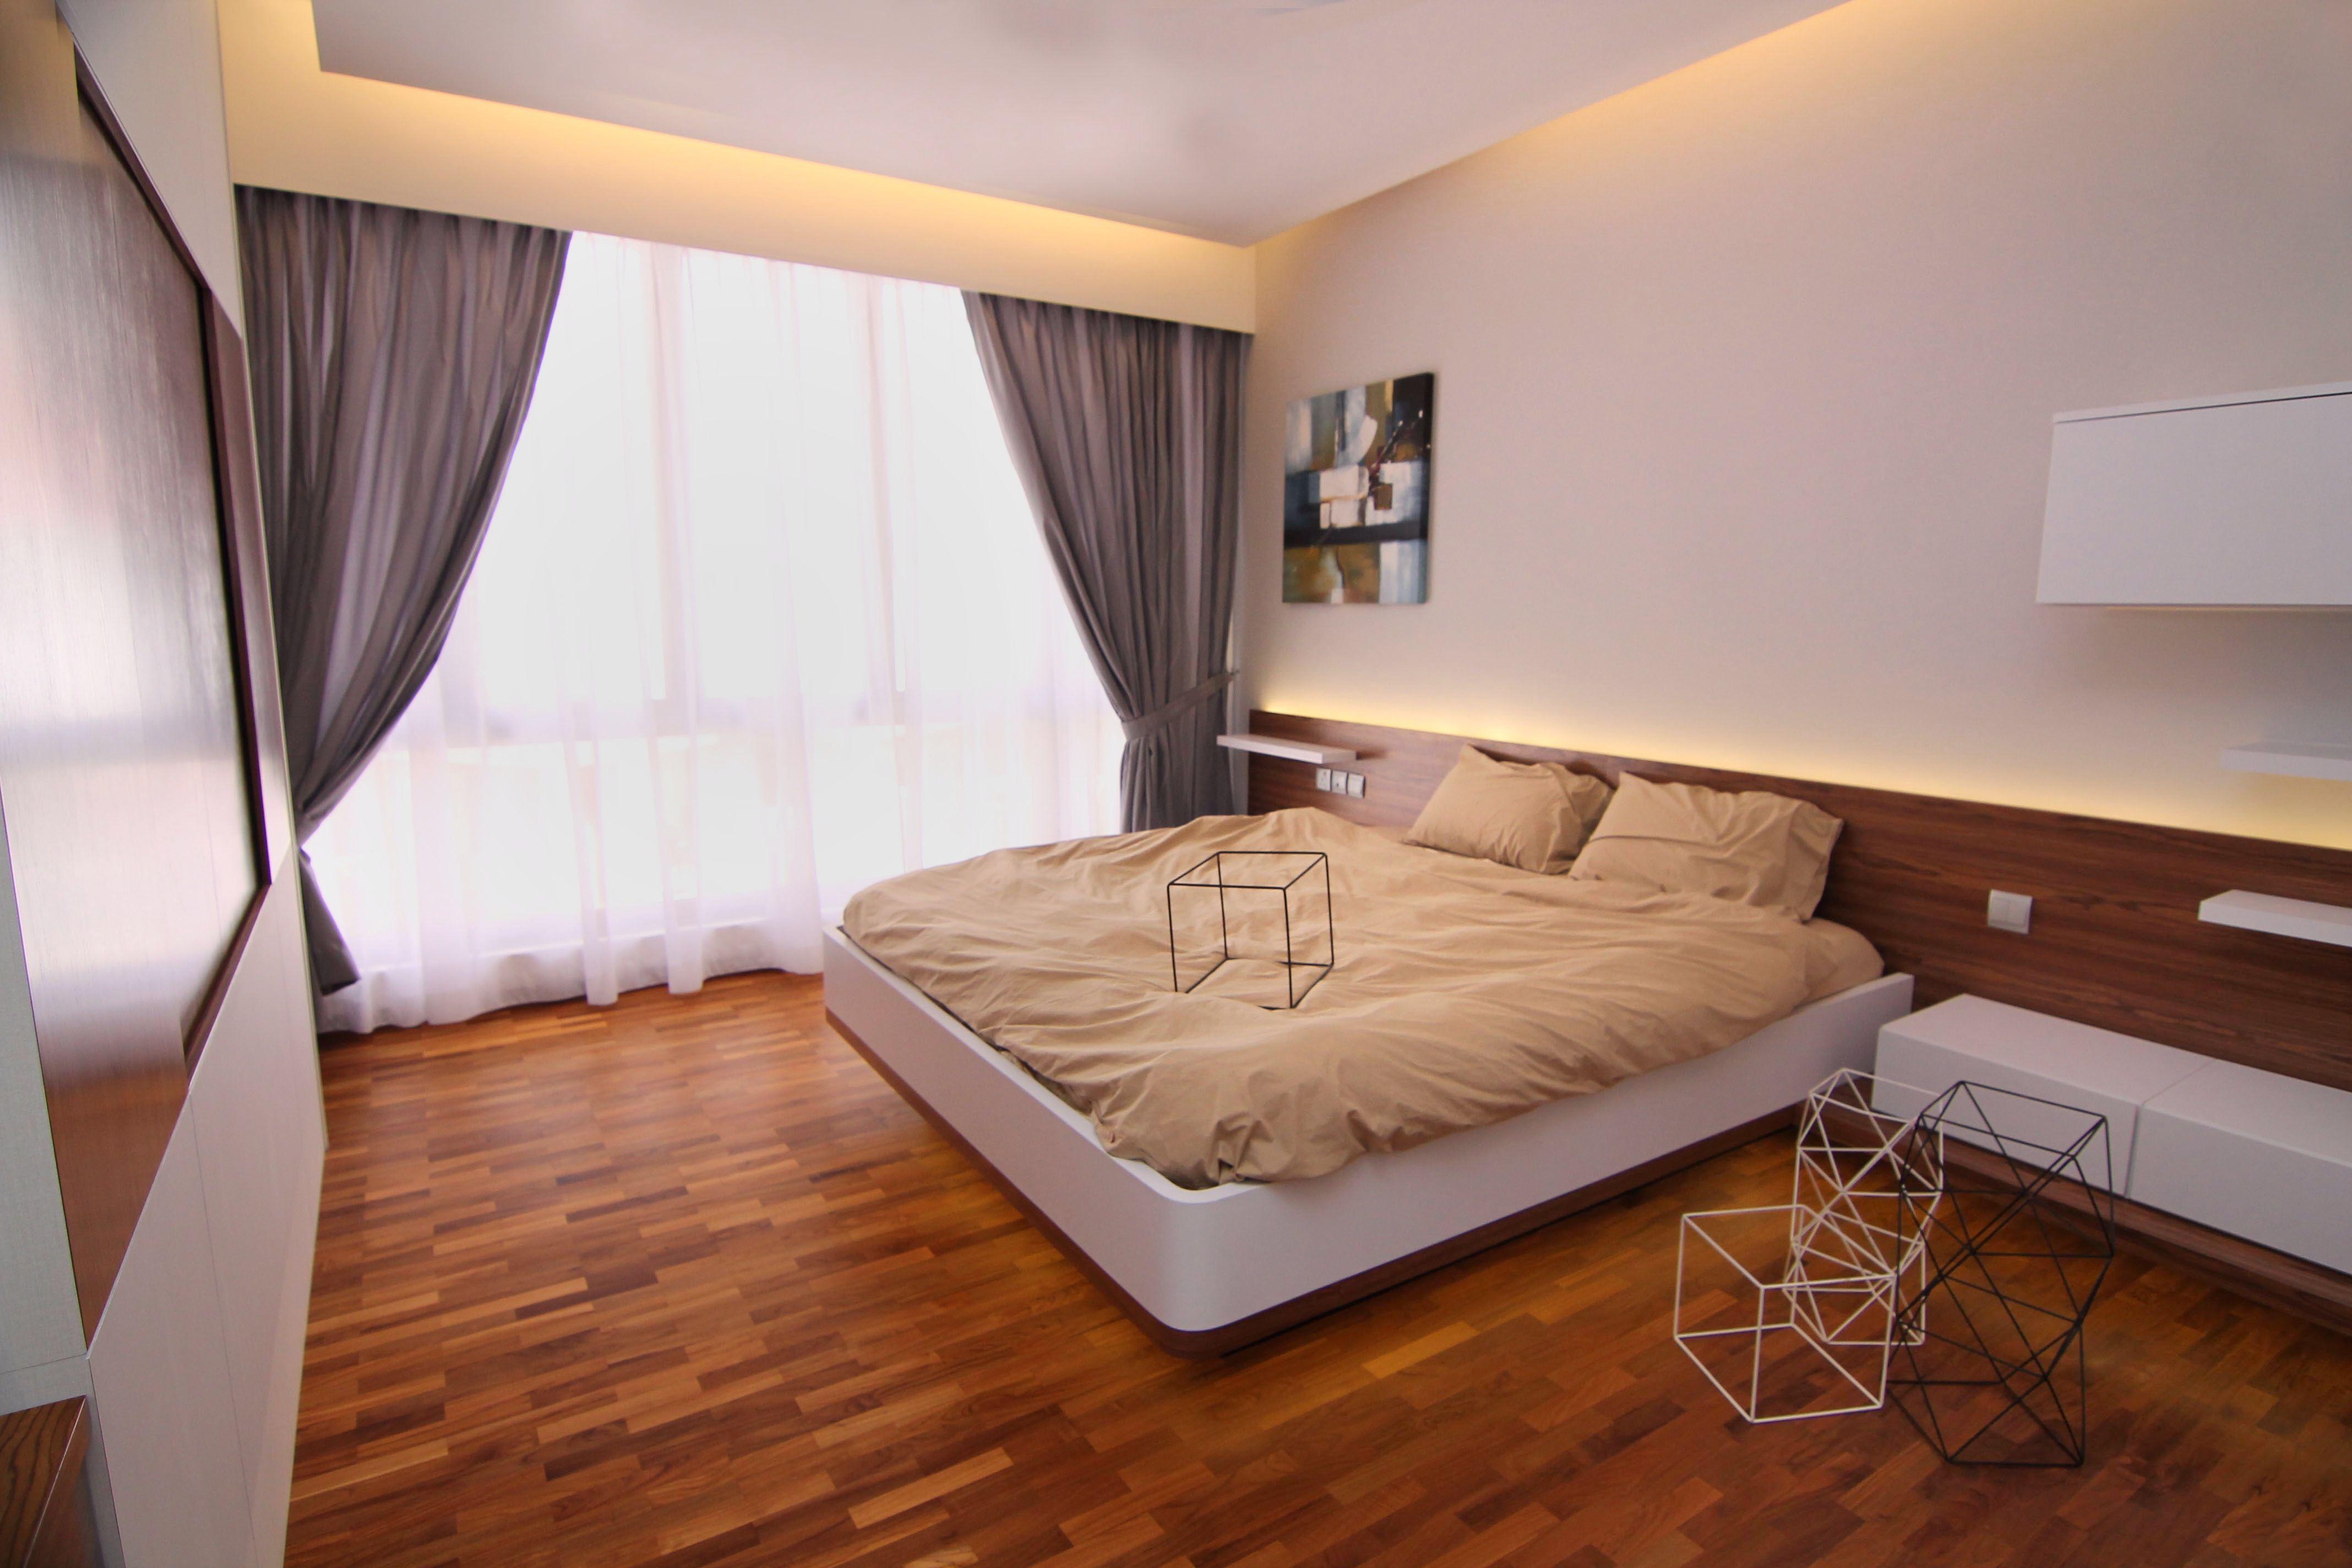 Bedroom | Home & Decor Singapore